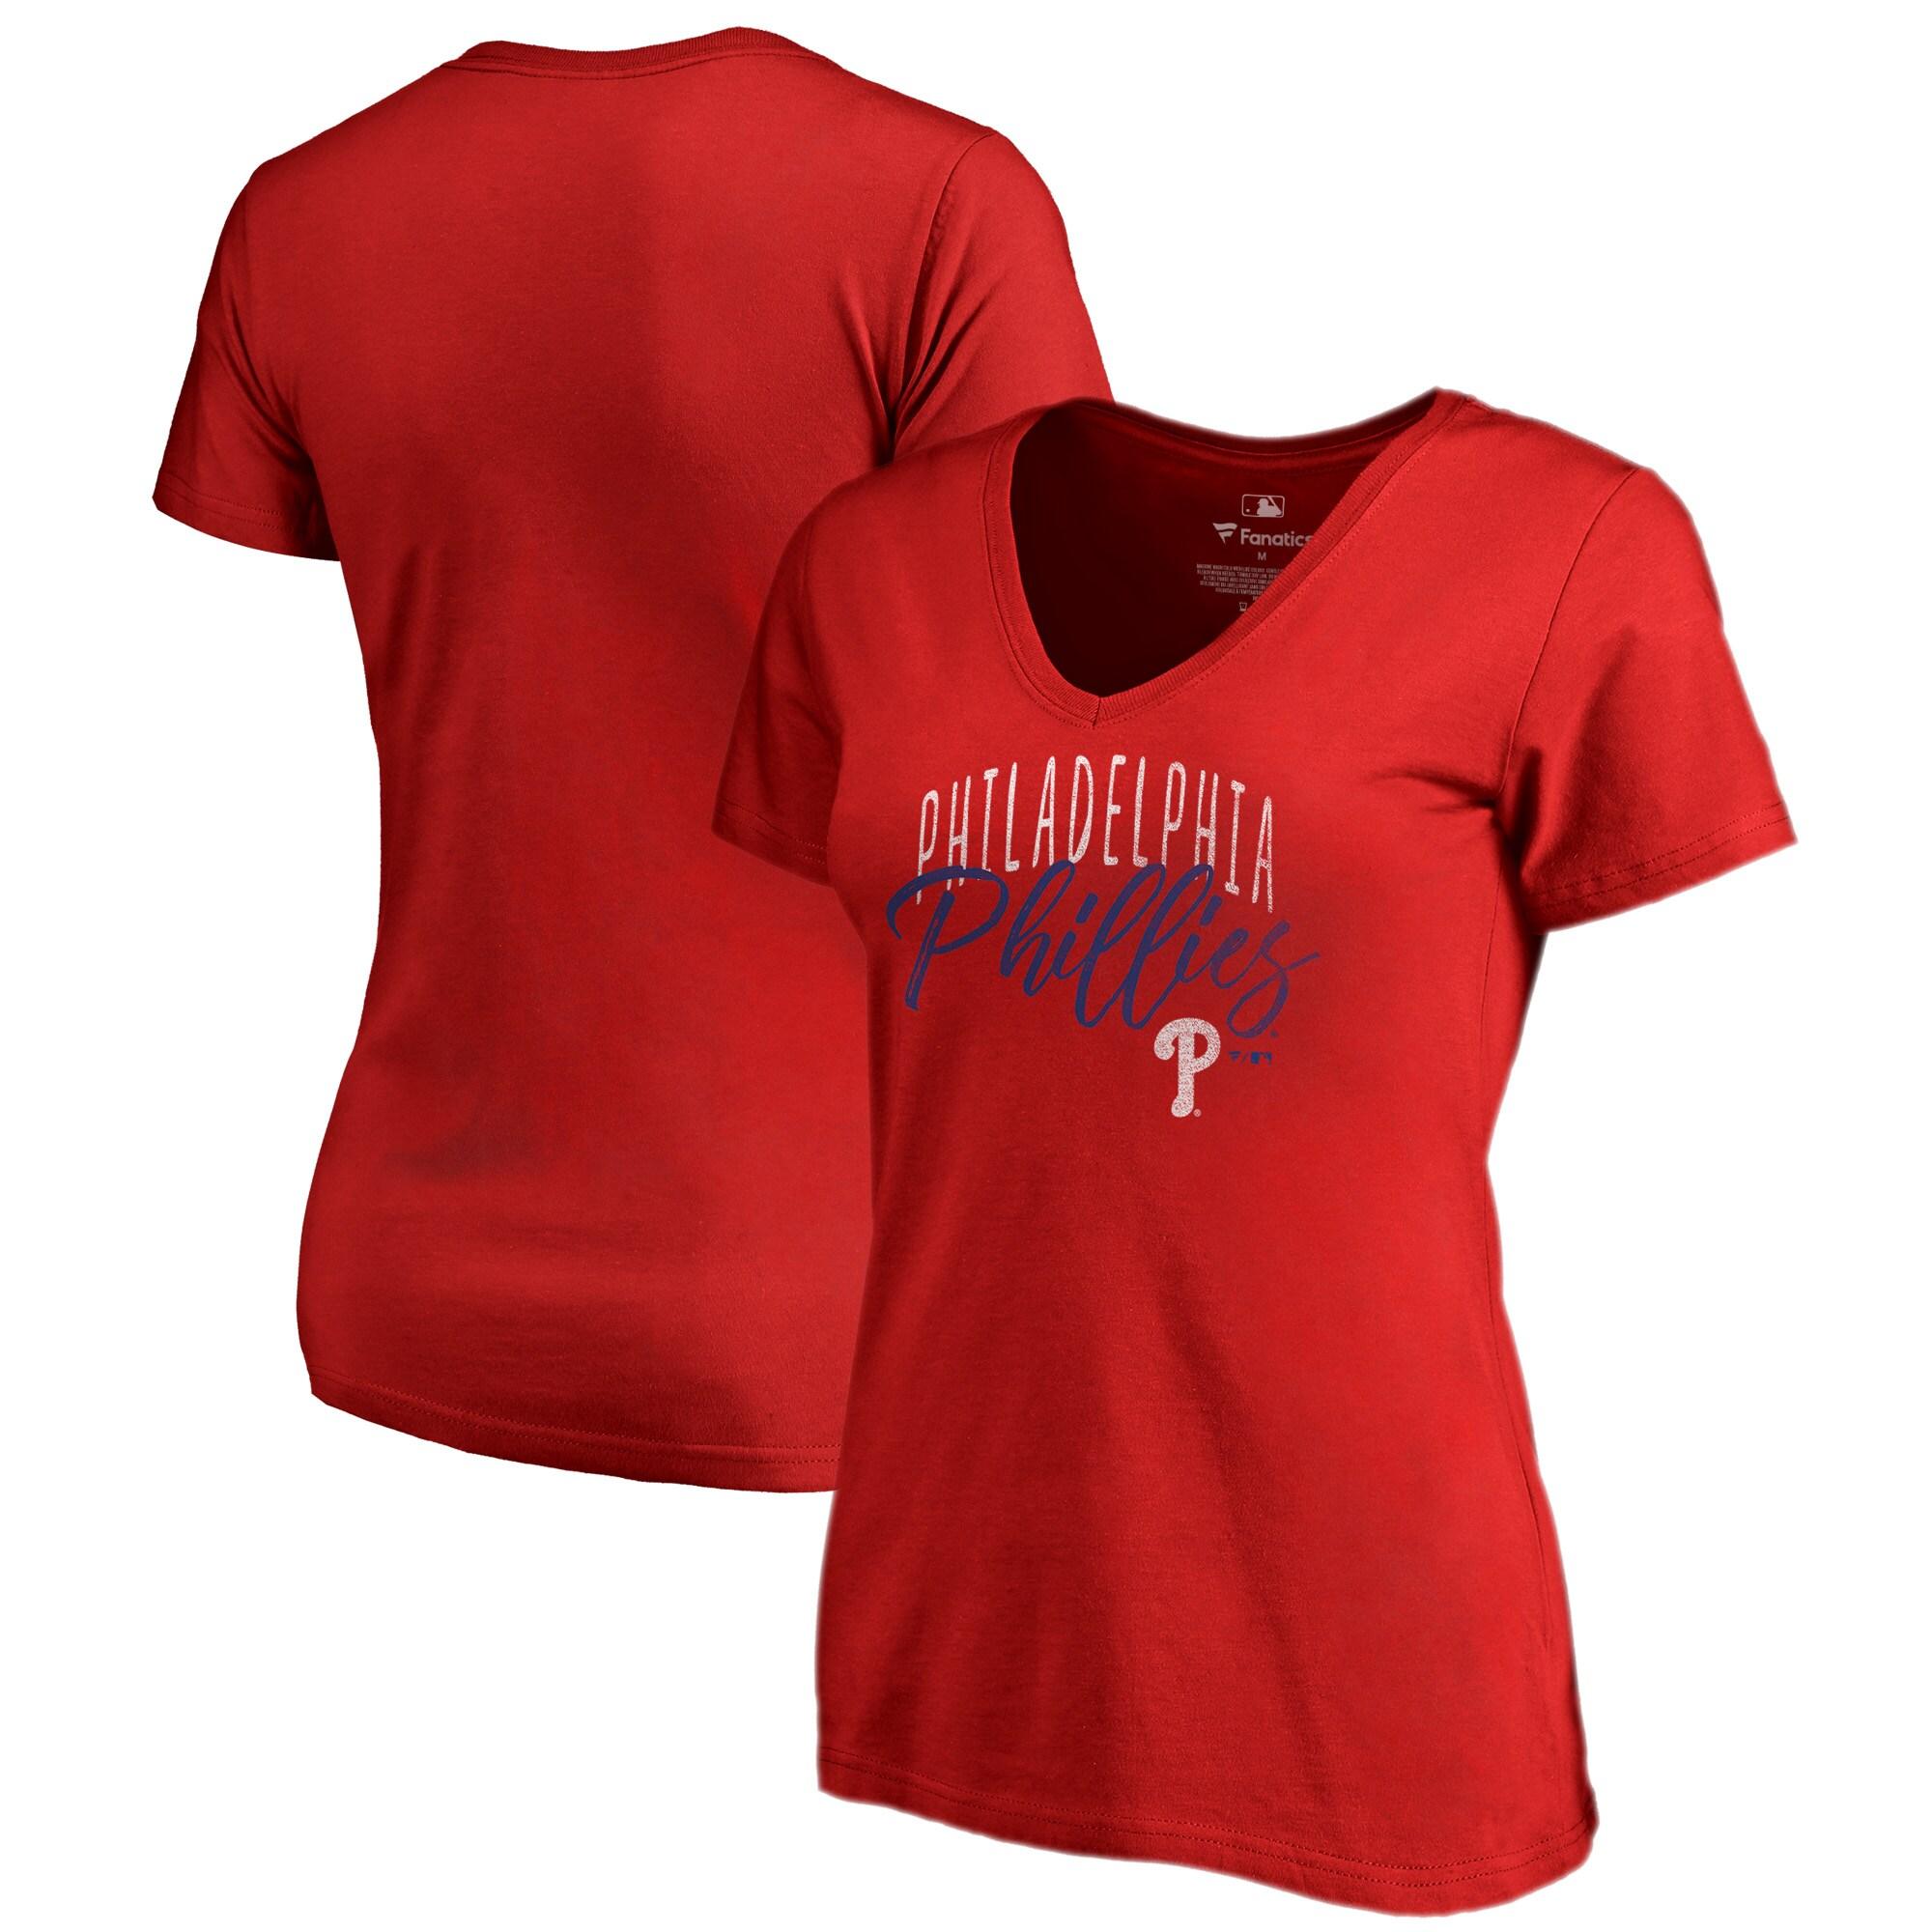 Philadelphia Phillies Fanatics Branded Women's Plus Size Graceful V-Neck T-Shirt - Red